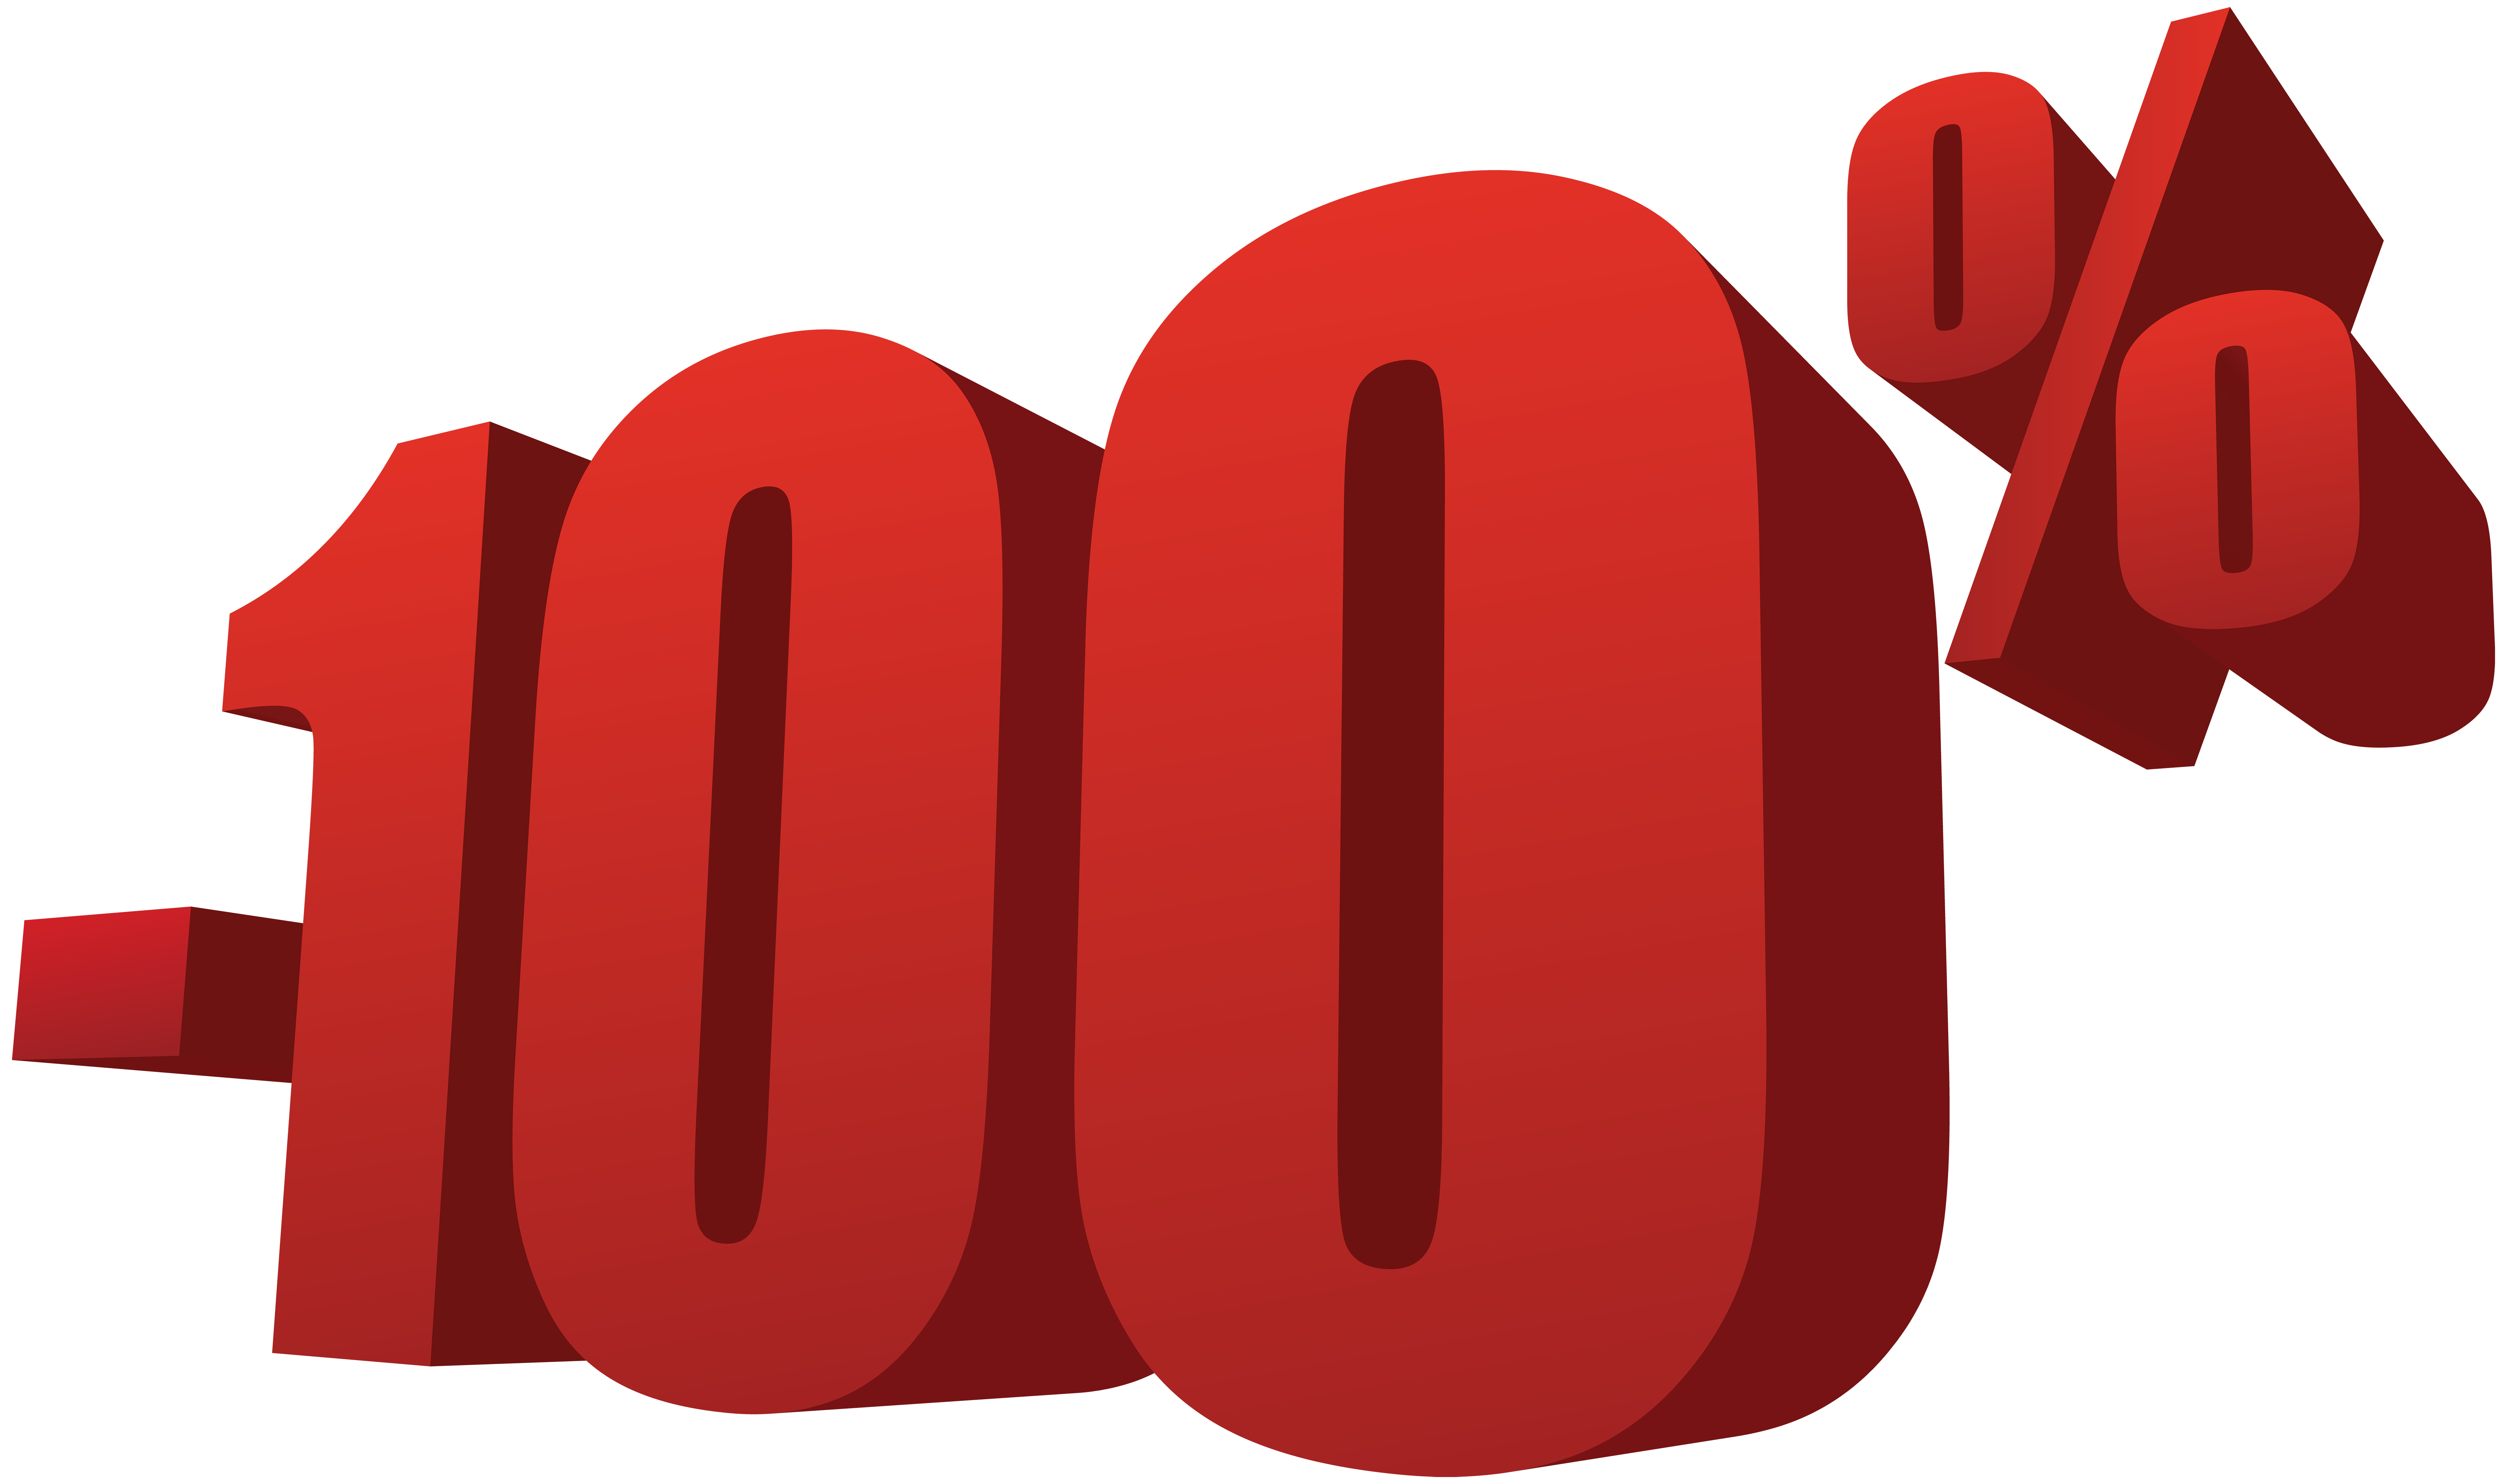 100% Off Sale PNG Transparent Image.